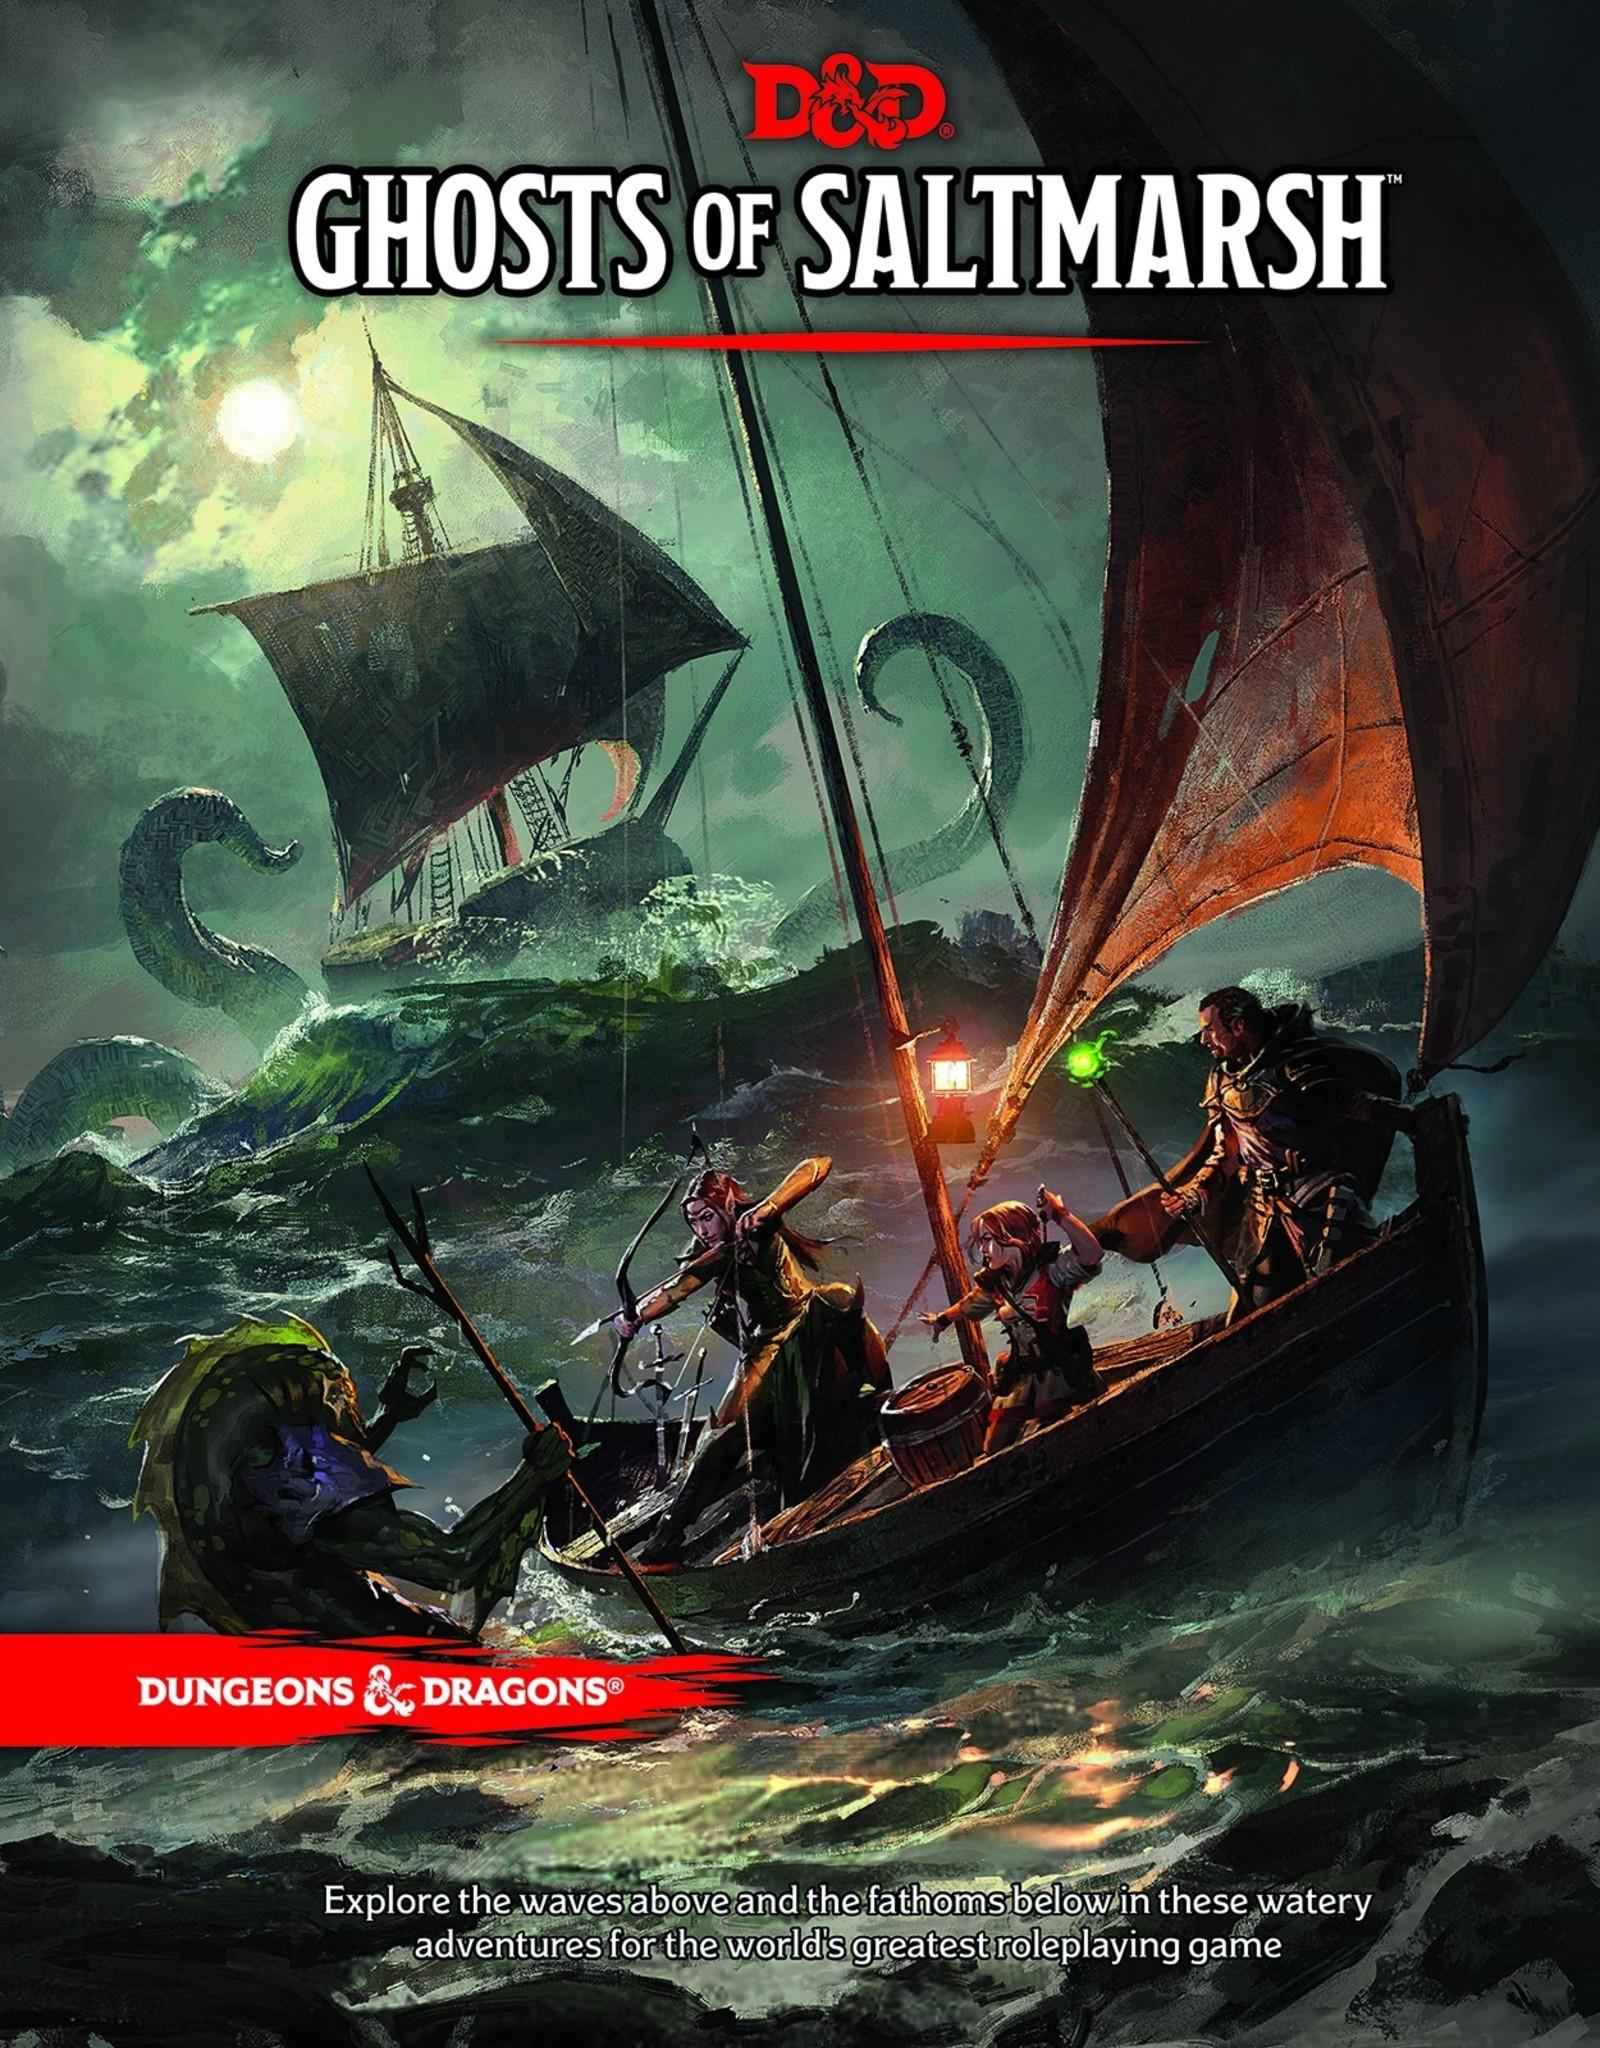 WOTC Dungeons & Dragons 5th ed: GHOSTS OF SALTMARSH ADVENTURE MODULE